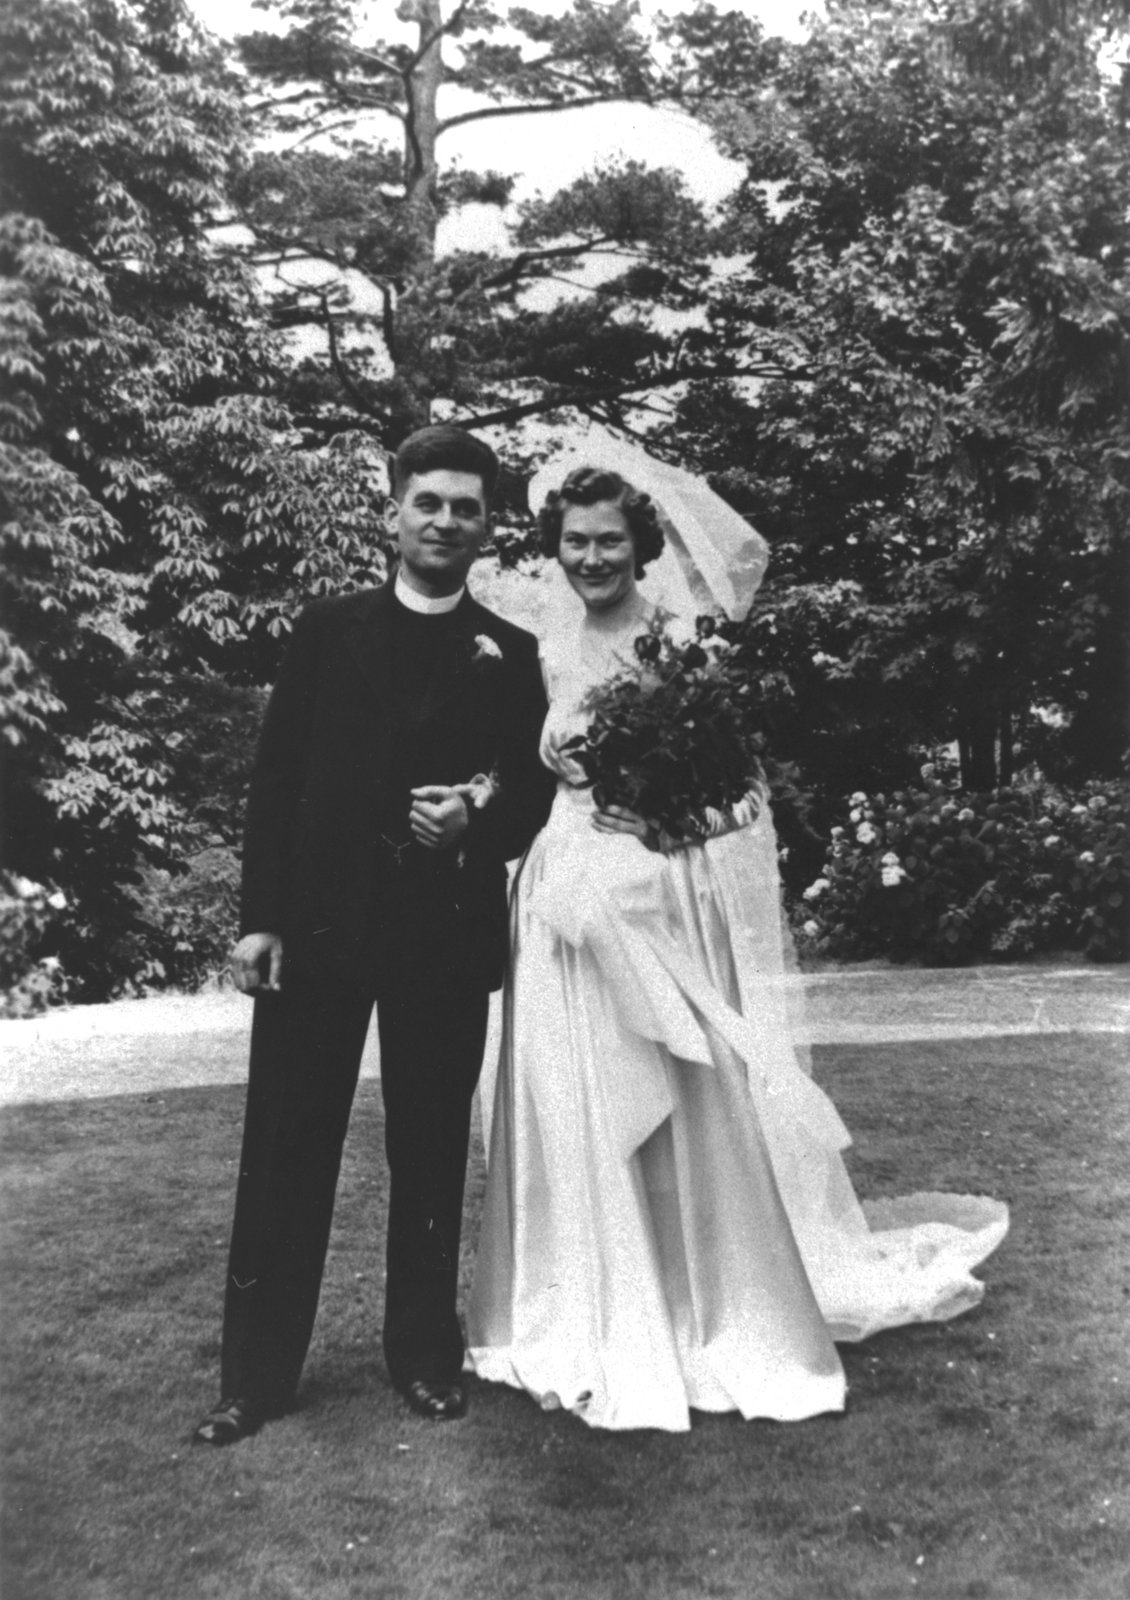 Ulrich Leupold and Gertrude Daber wedding portrait,  July 11, 1942